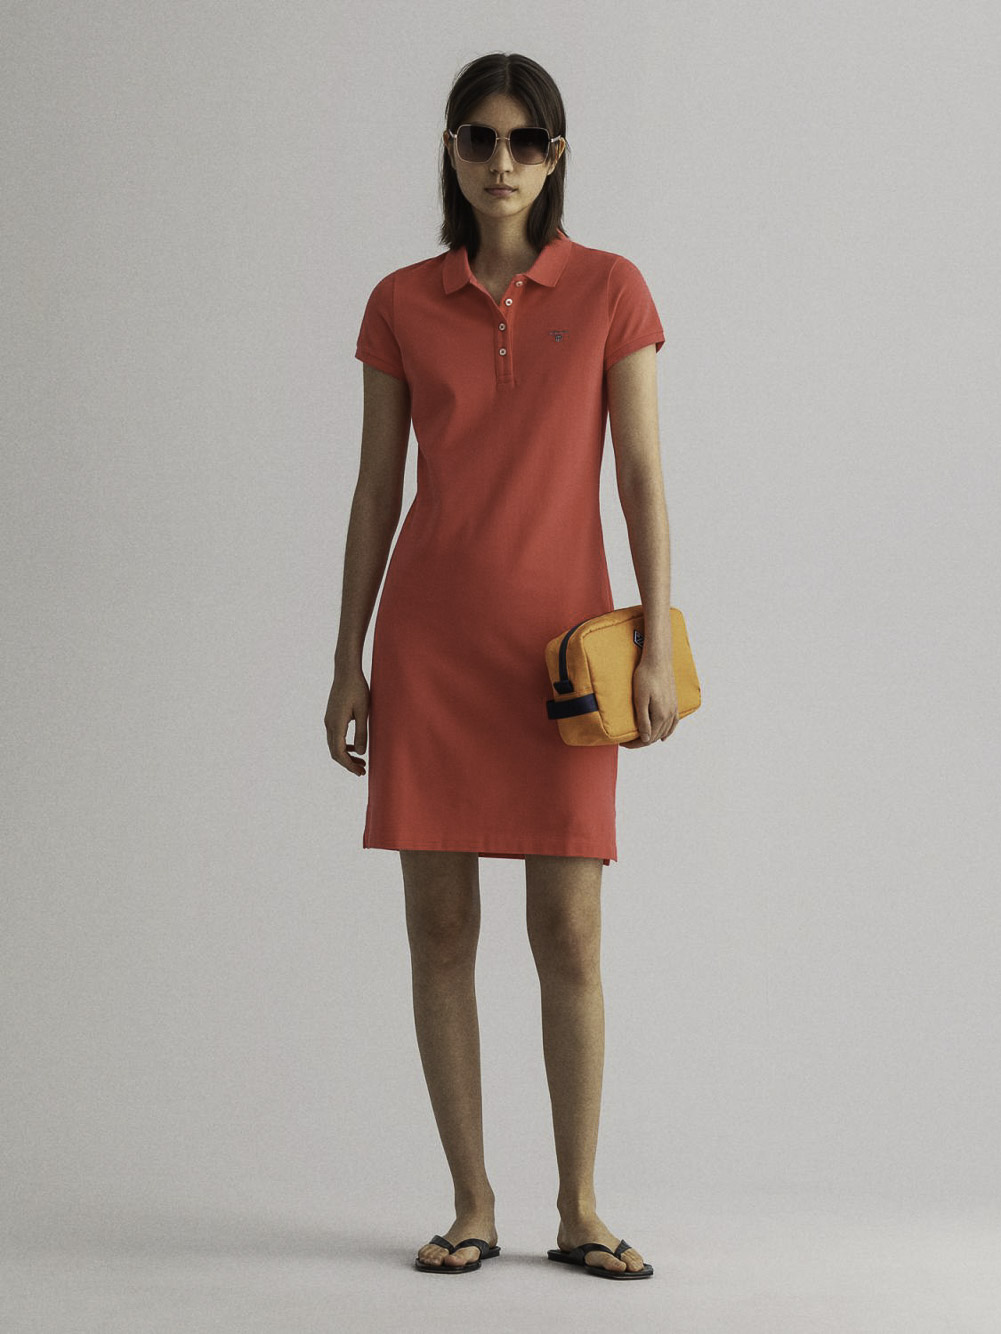 GANT Φόρεμα polo 3GW402300-648 ΚΟΡΑΛΙ